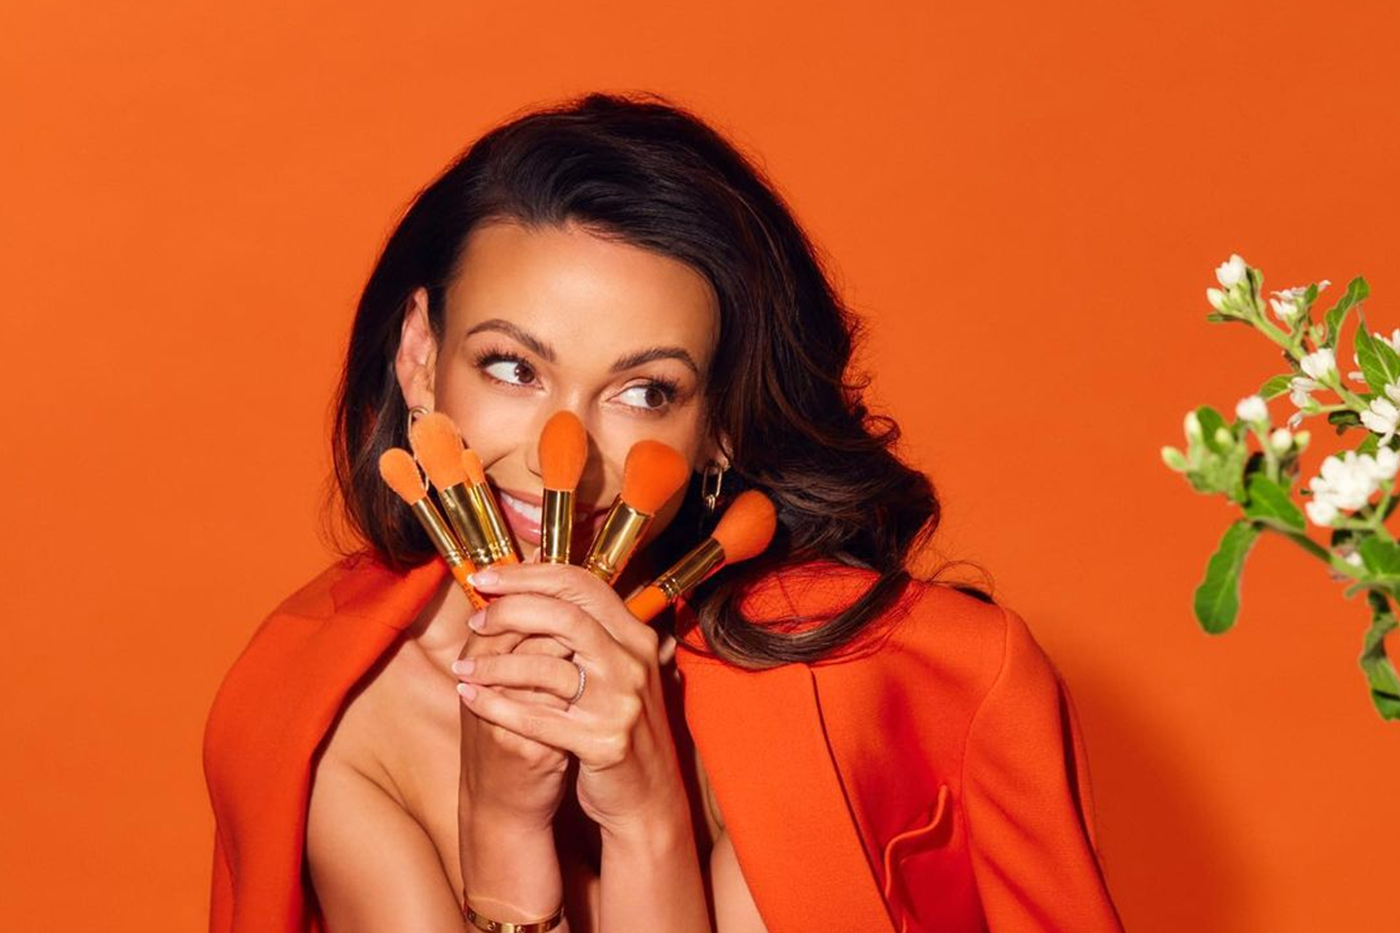 Michelle Kegan unveils make-up line with Spectrum